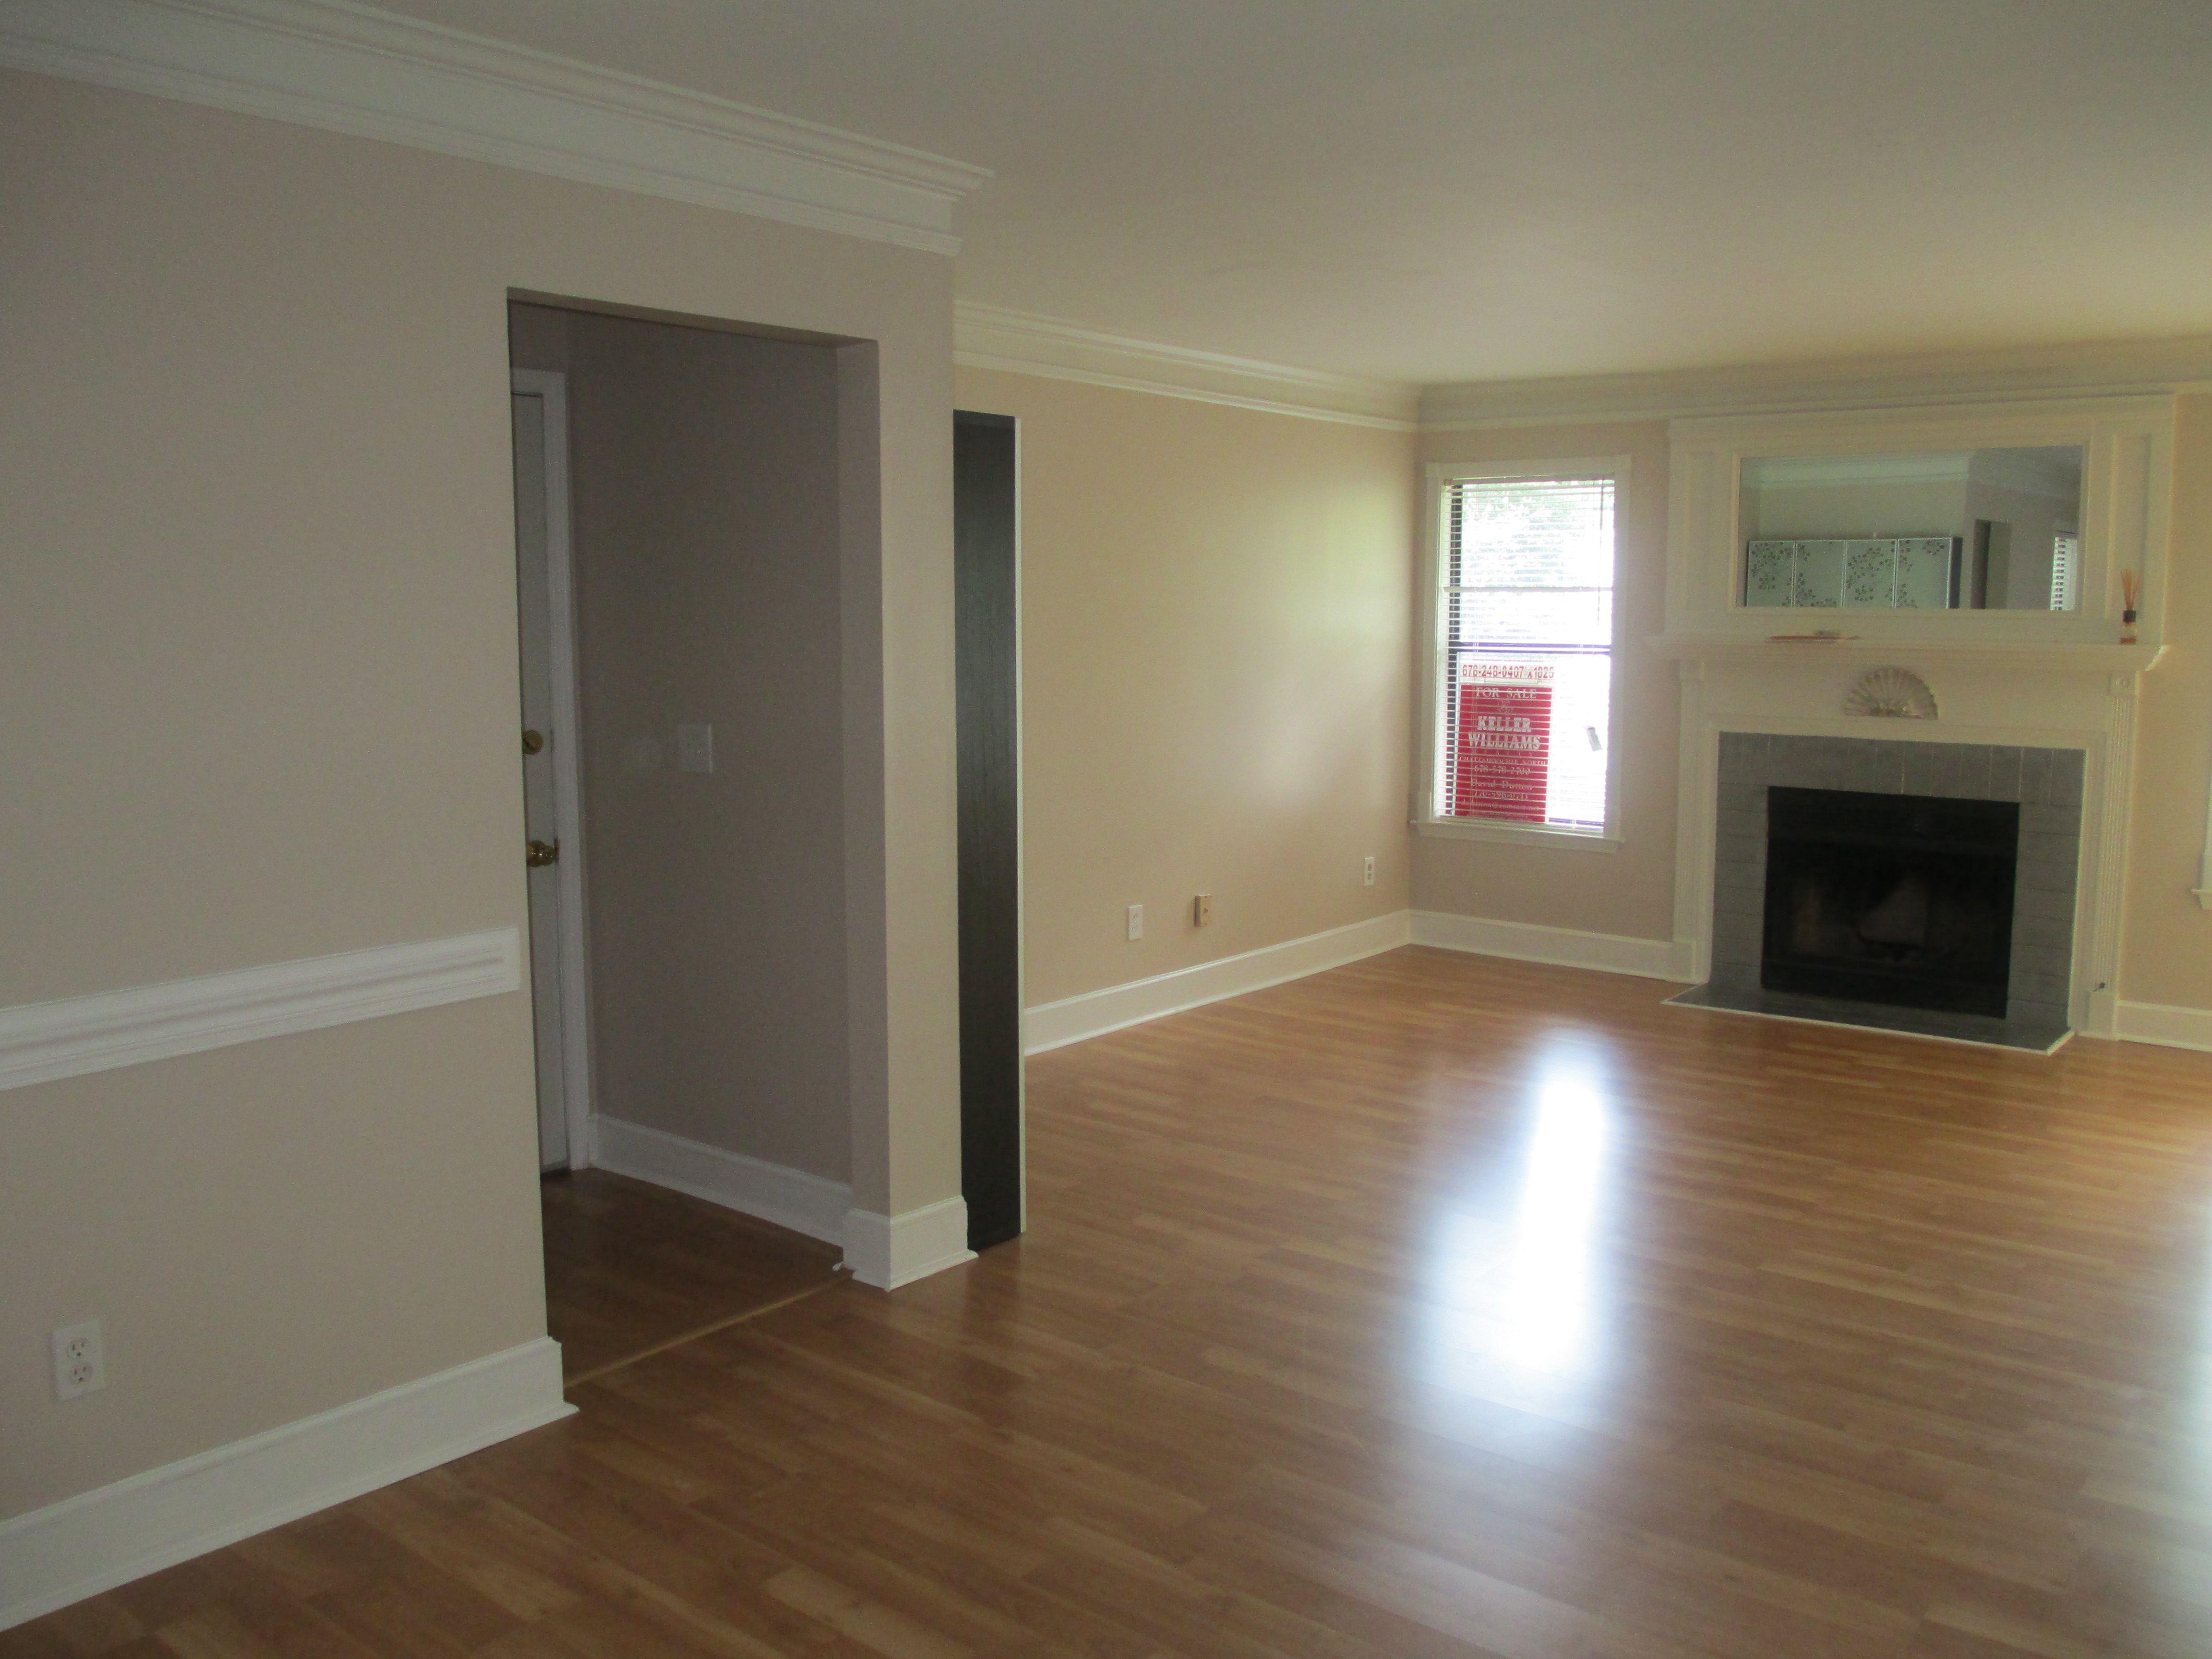 empty living room | Home Sweet Home | Pinterest